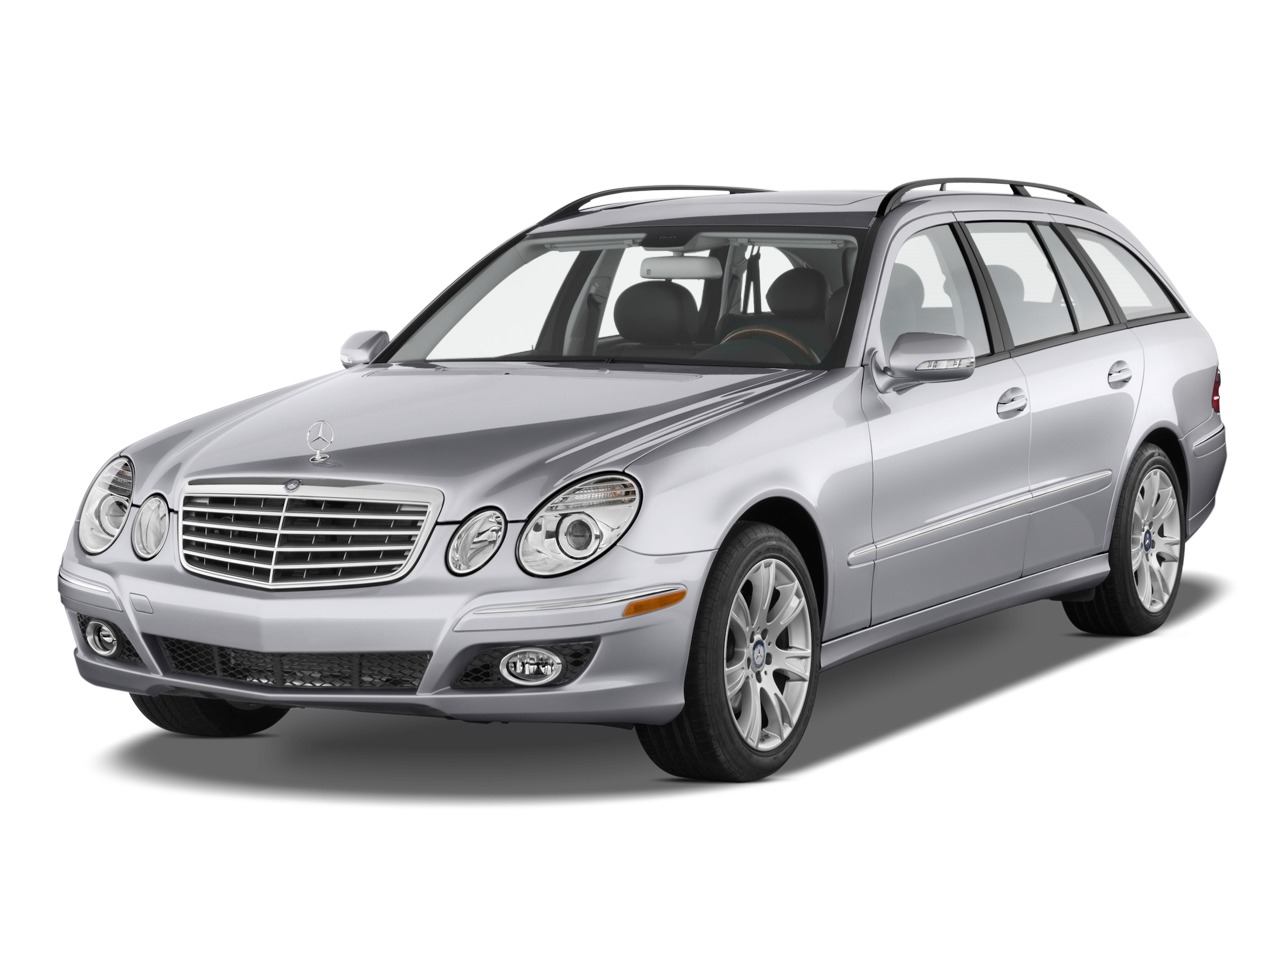 2009 mercedes benz e320 bluetec fuel efficient cars hybrids and reviews automobile magazine. Black Bedroom Furniture Sets. Home Design Ideas